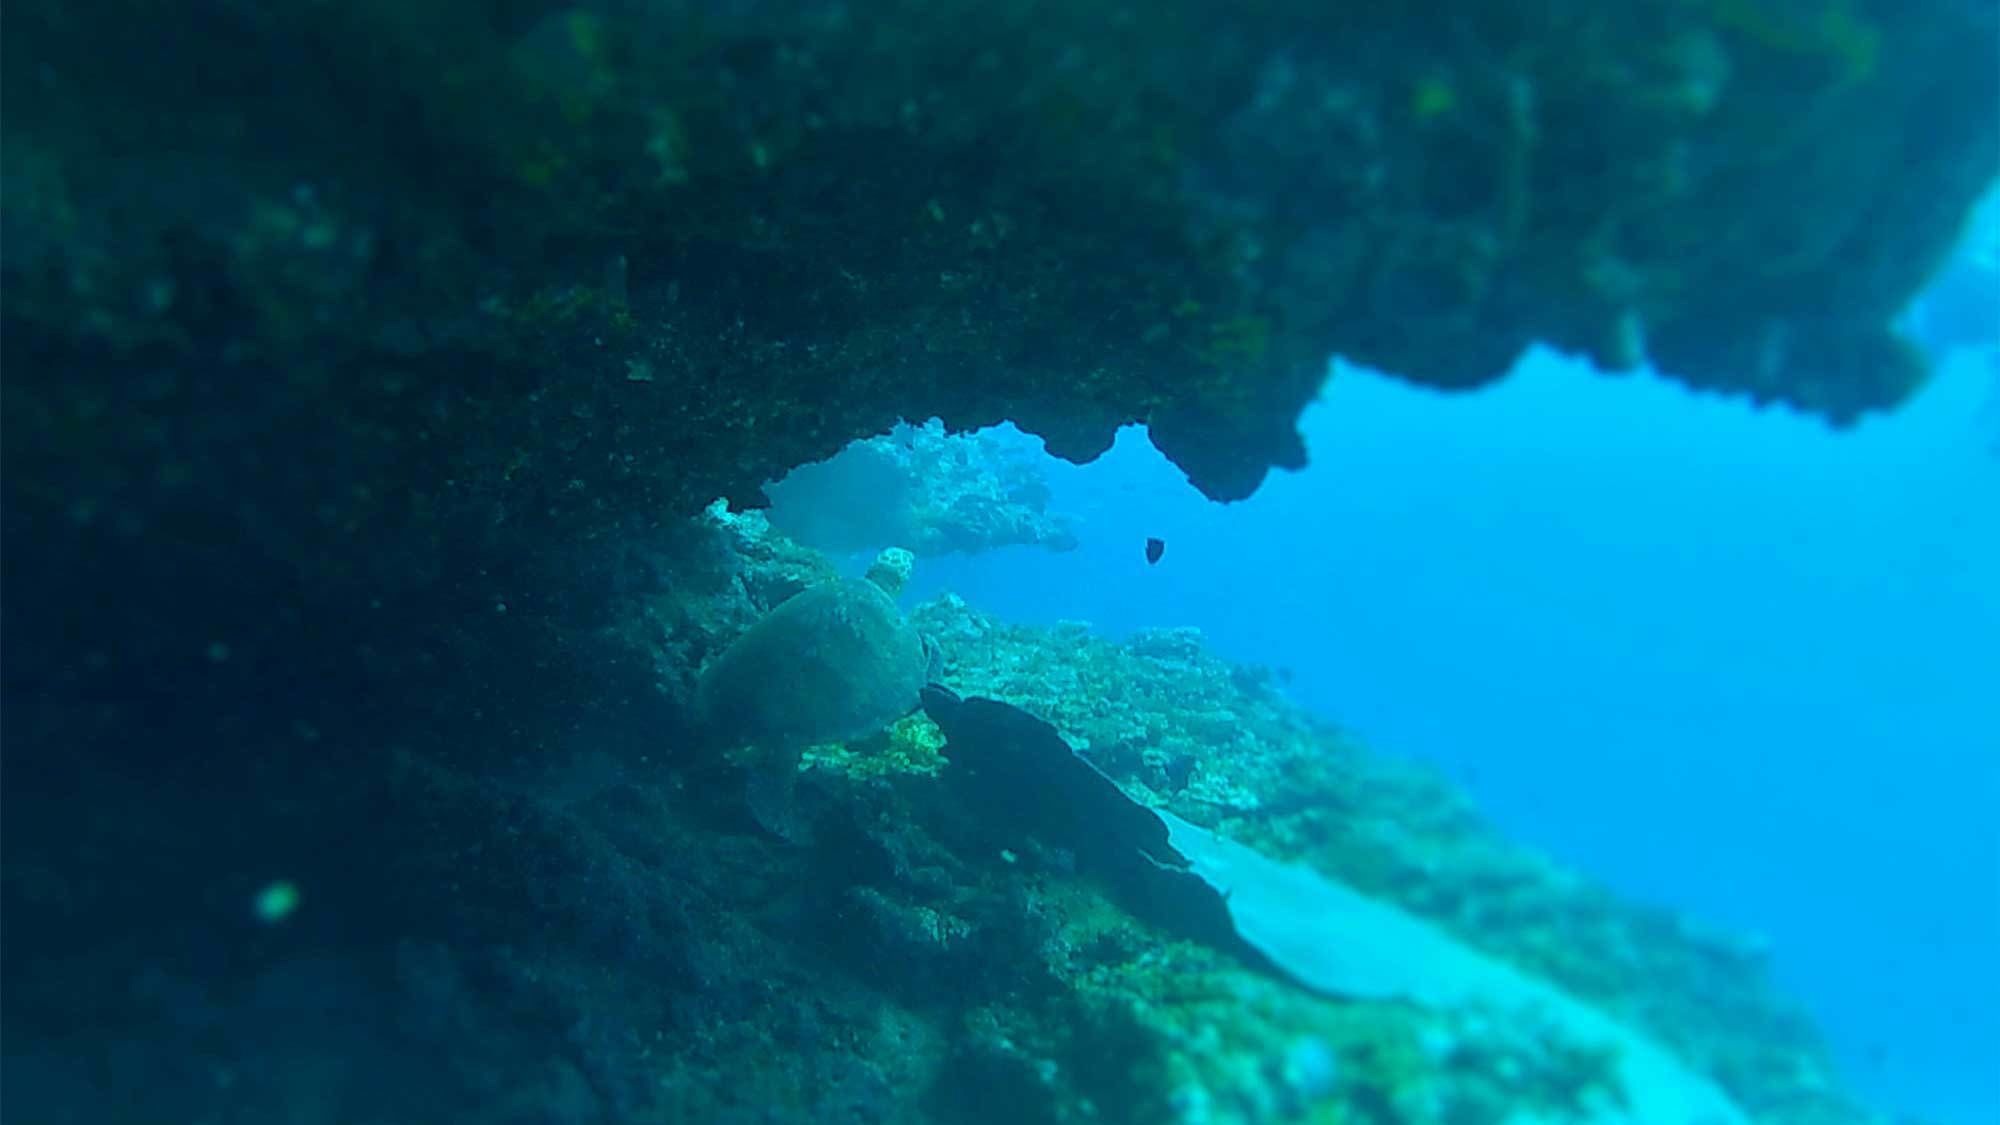 View underwater at Forgotten Bay in Samoa